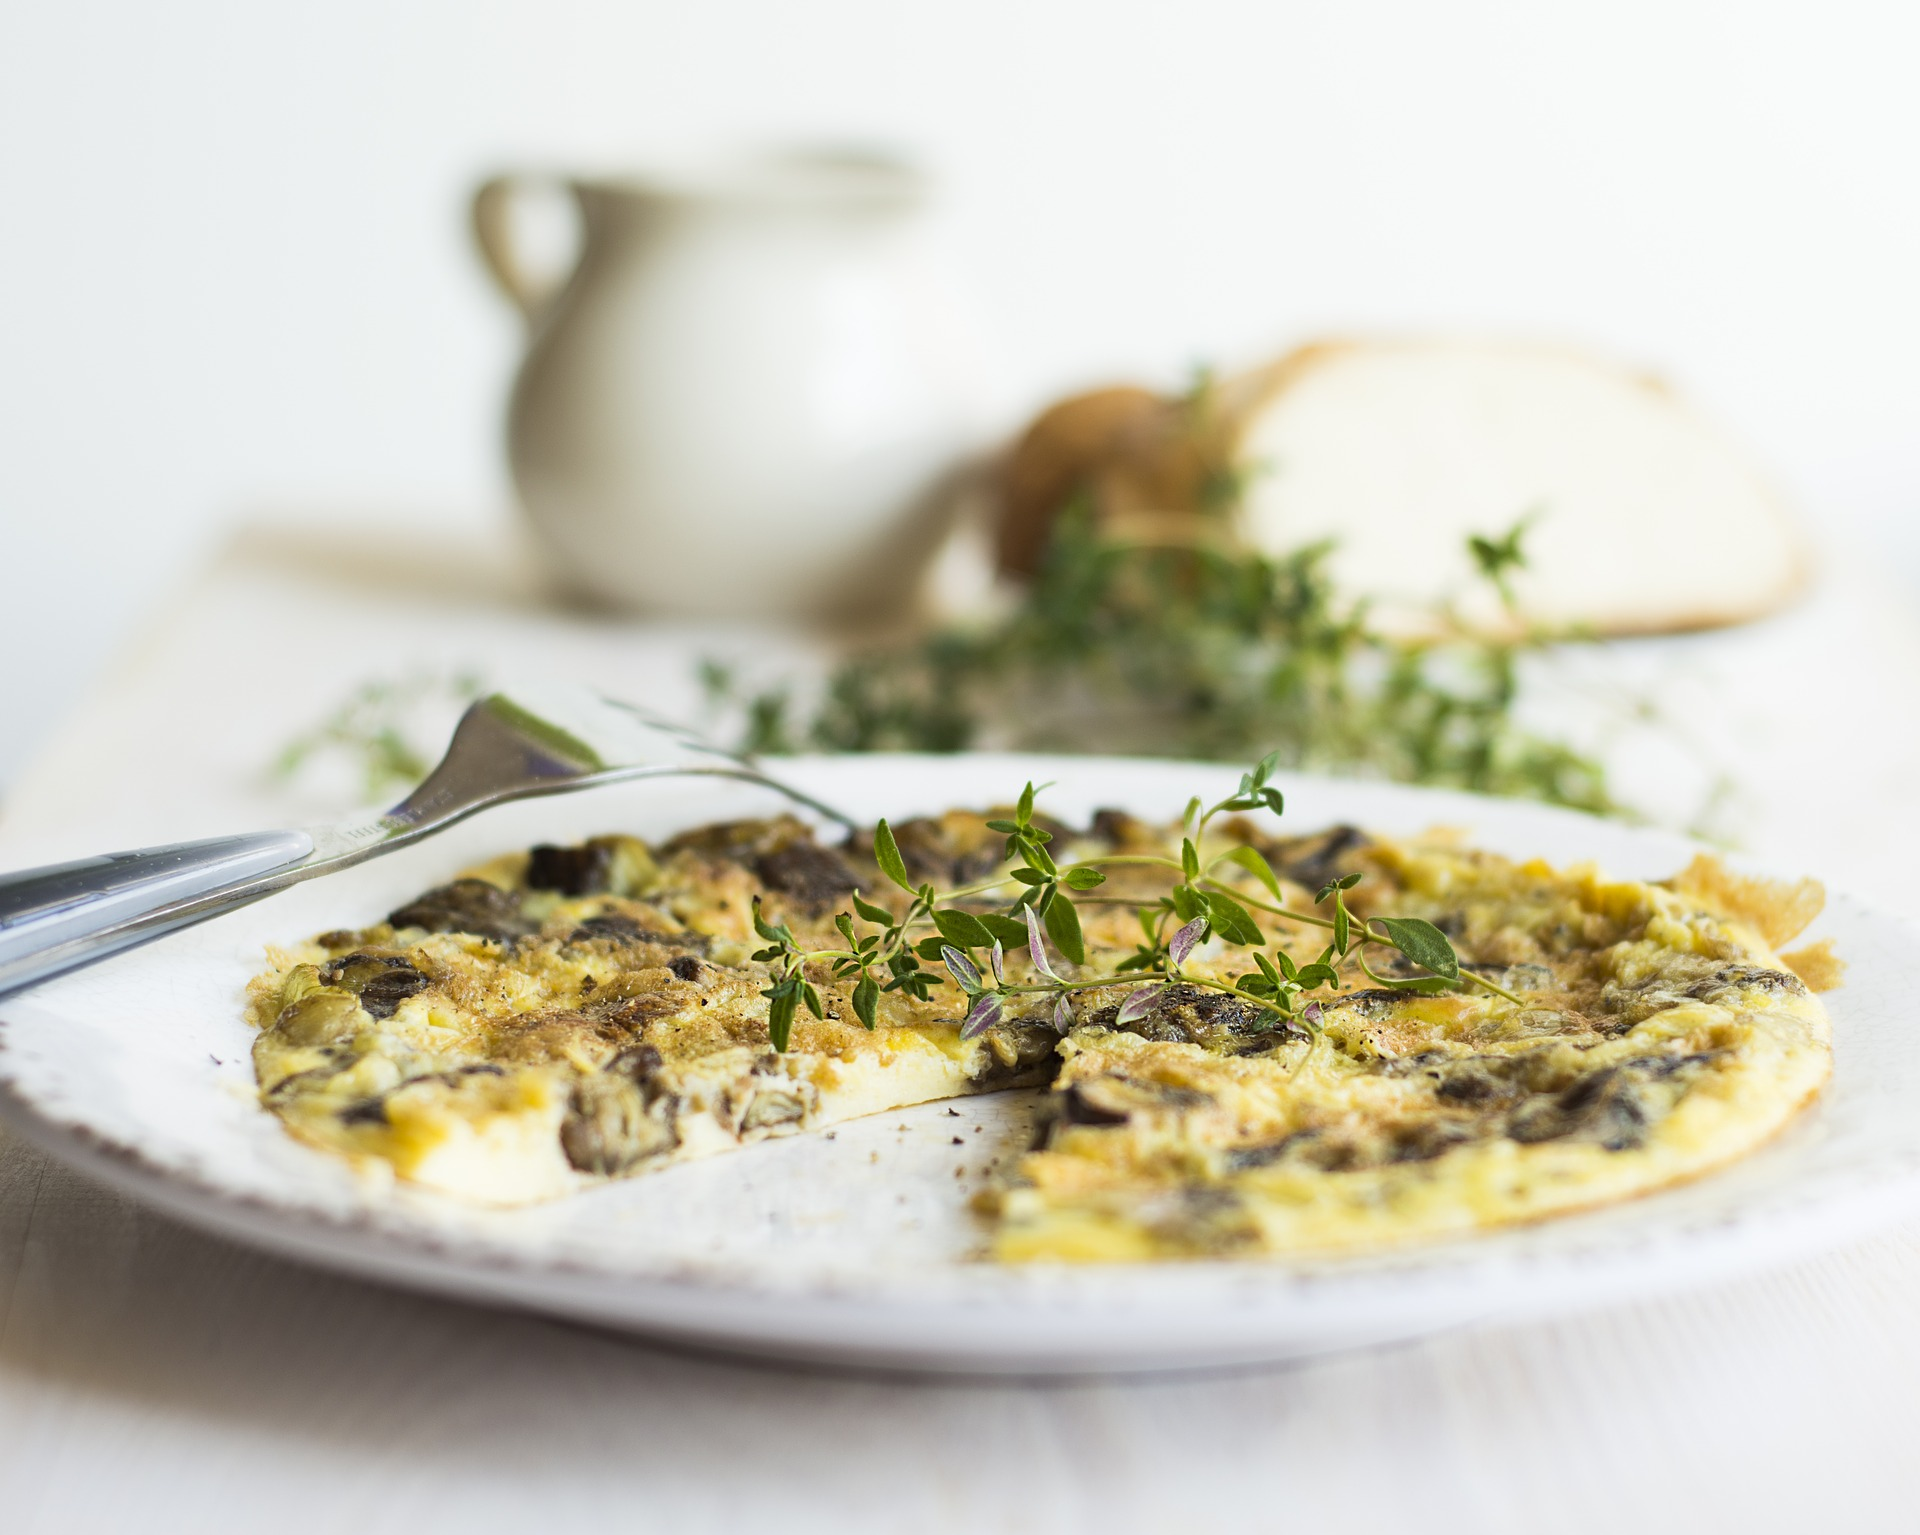 recette omelette aux truffes